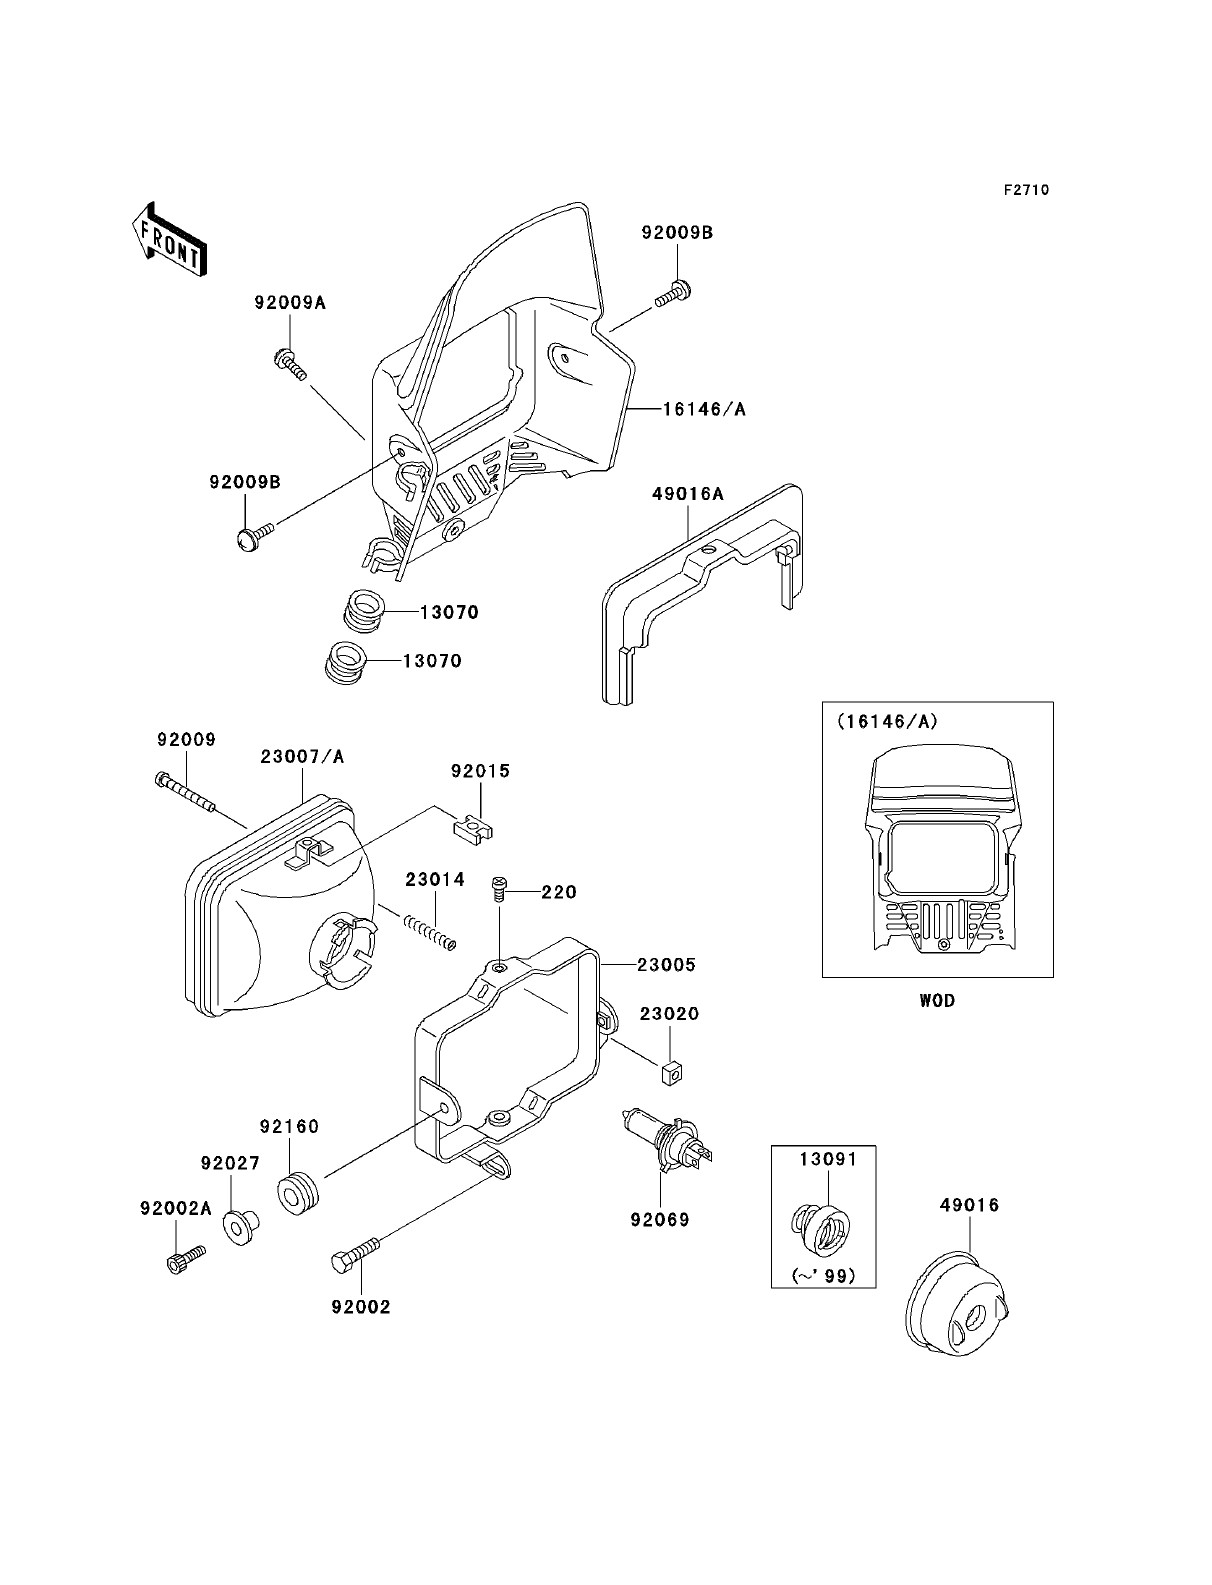 drum brake assembly diagram kawasaki klr250 kawasaki klr250 parts diagrams  u2013 my wiring diagram